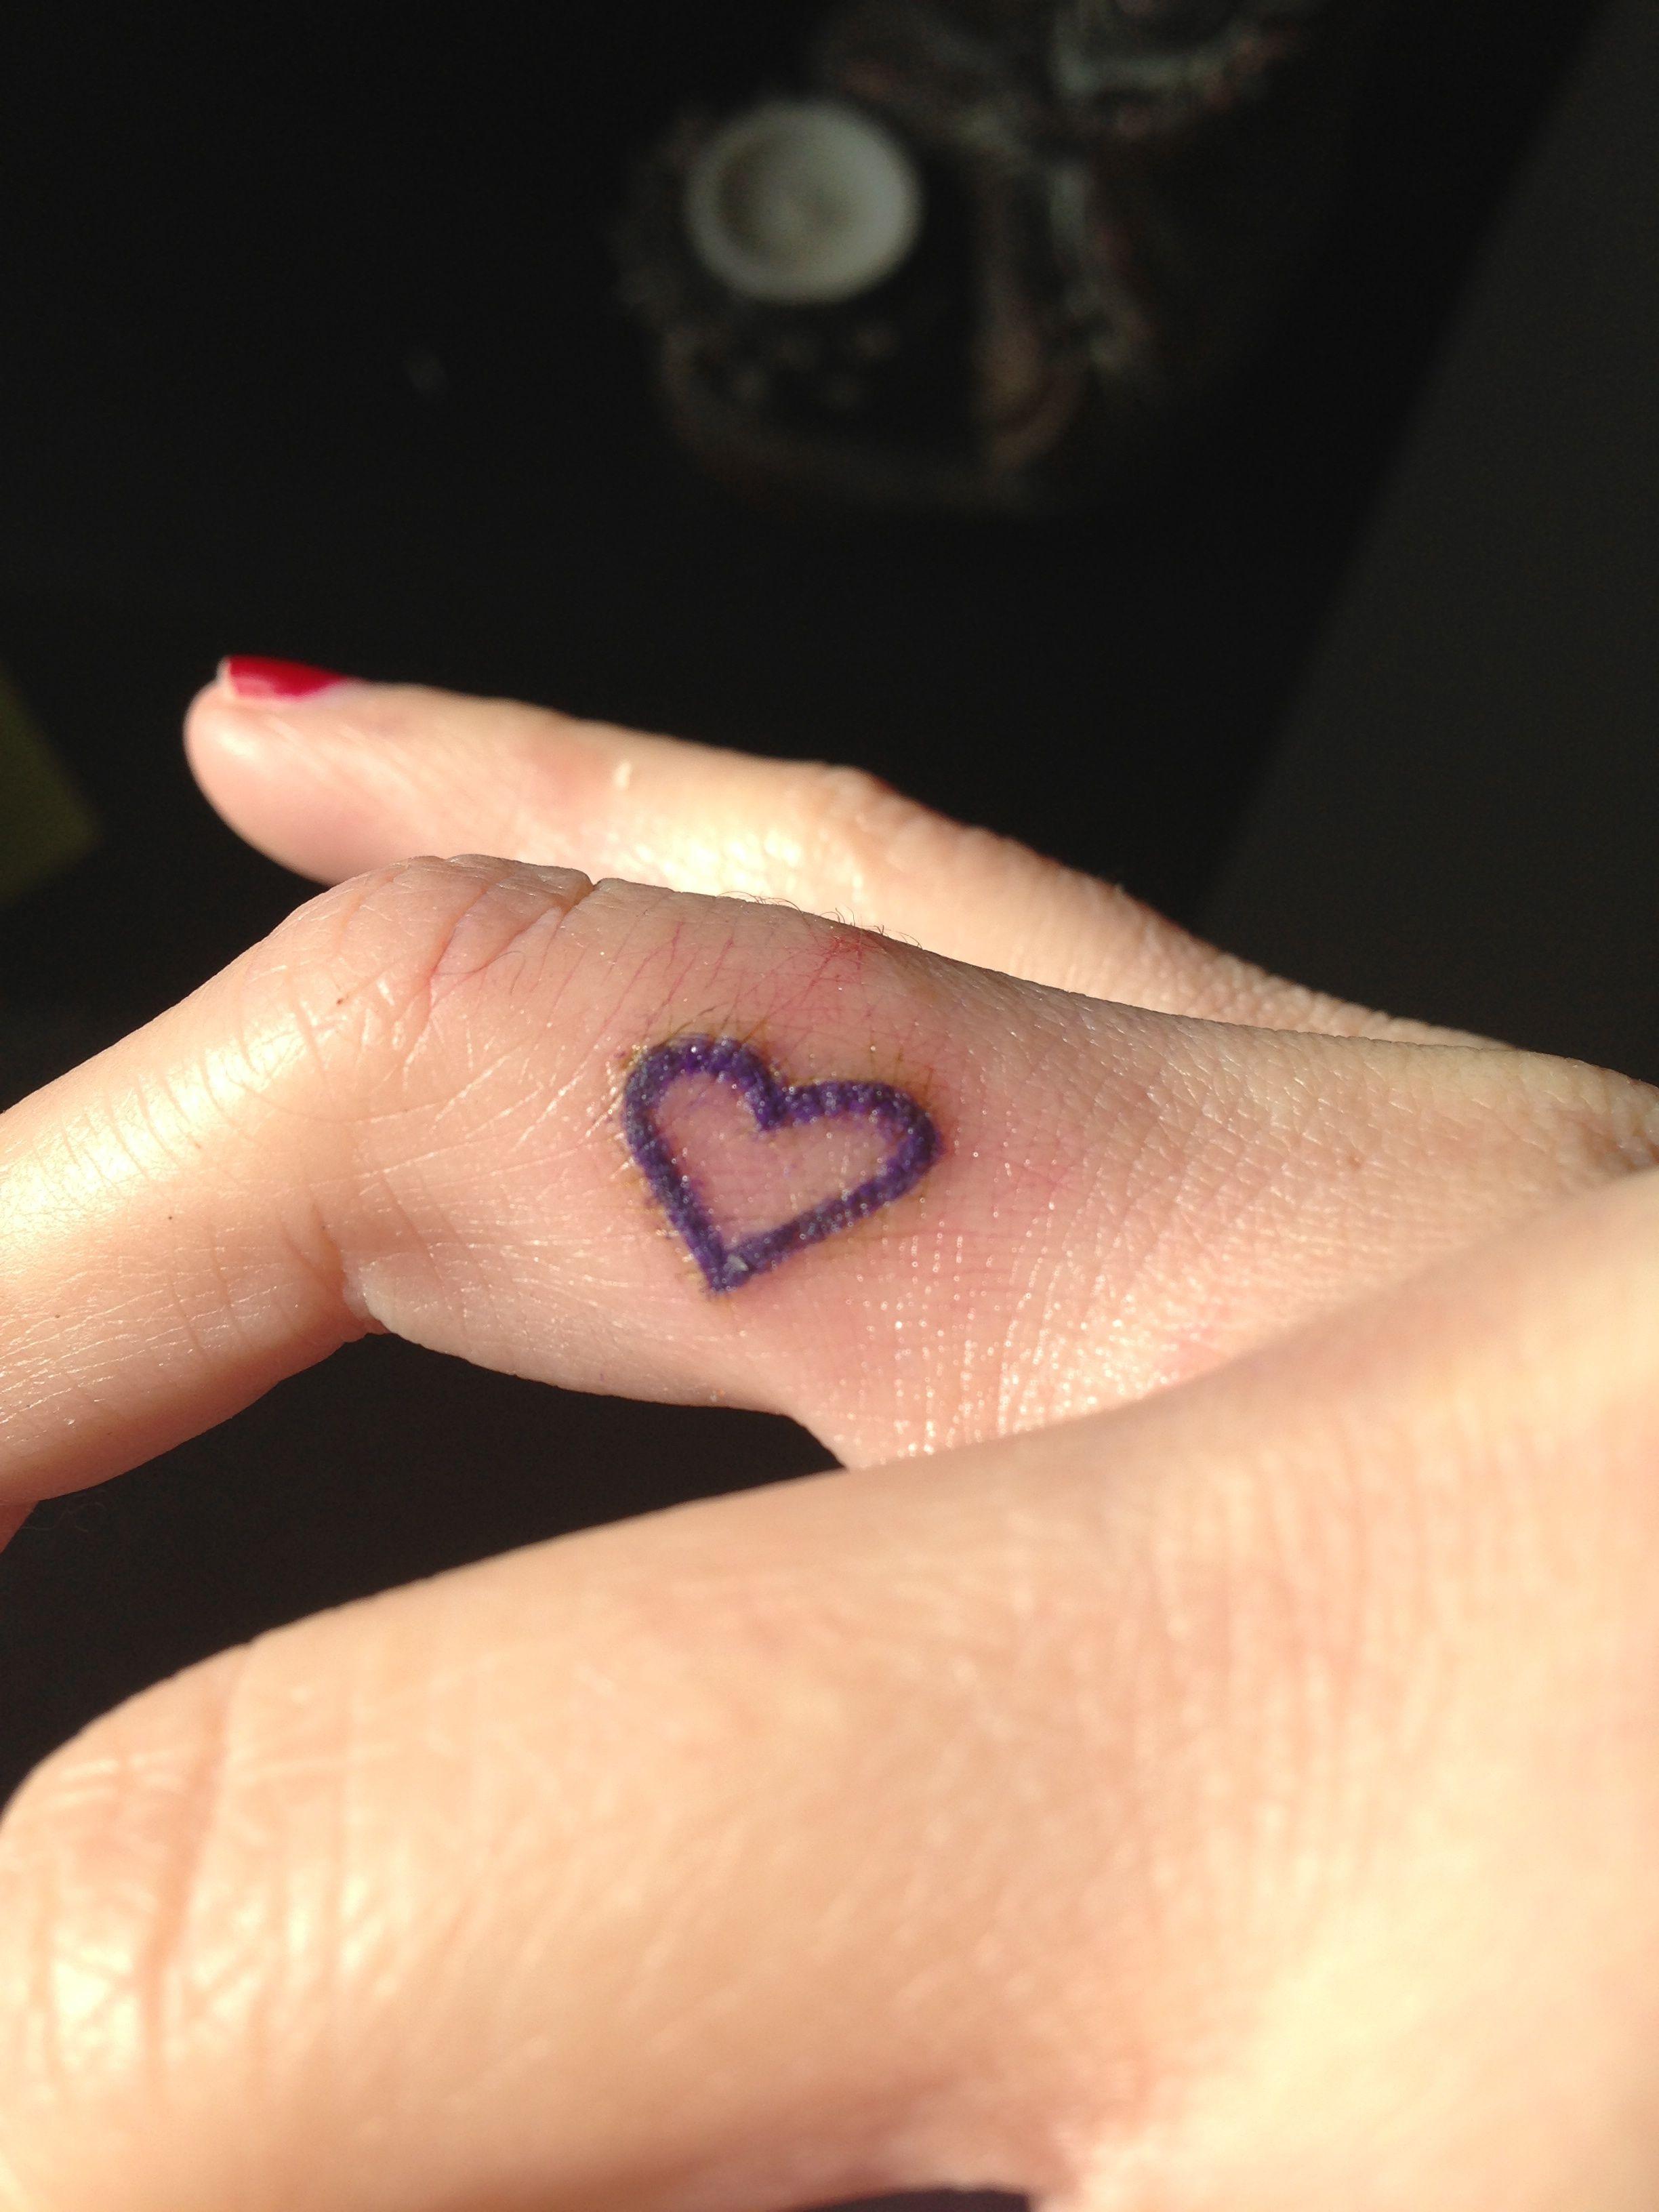 Heart Finger Tattoo Jpg 2448 3264 Purple Heart Tattoos Heart Tattoo On Finger Heart Tattoo Wrist